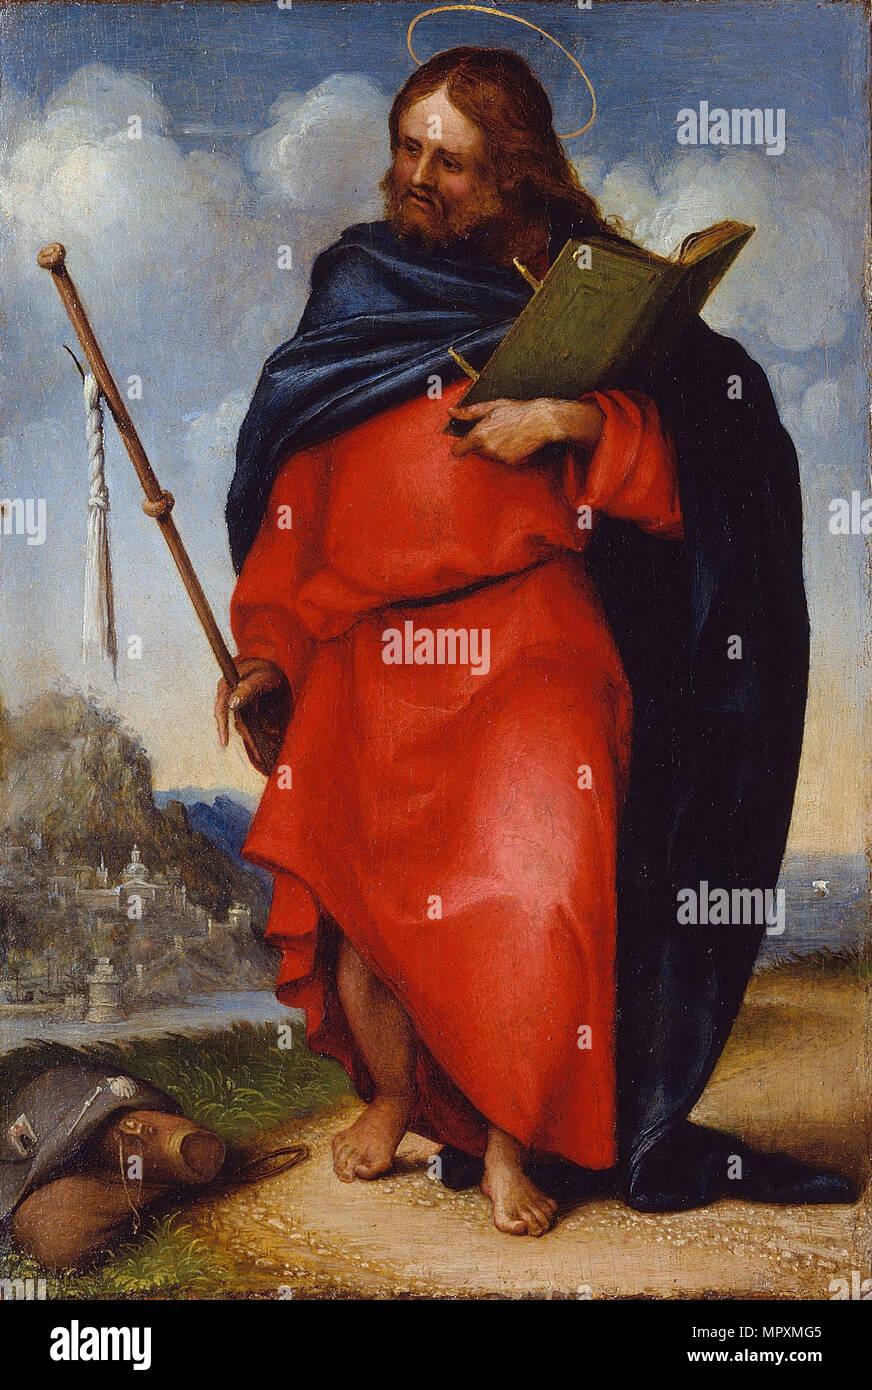 Apostle Saint James the Great, 1516. - Stock Image